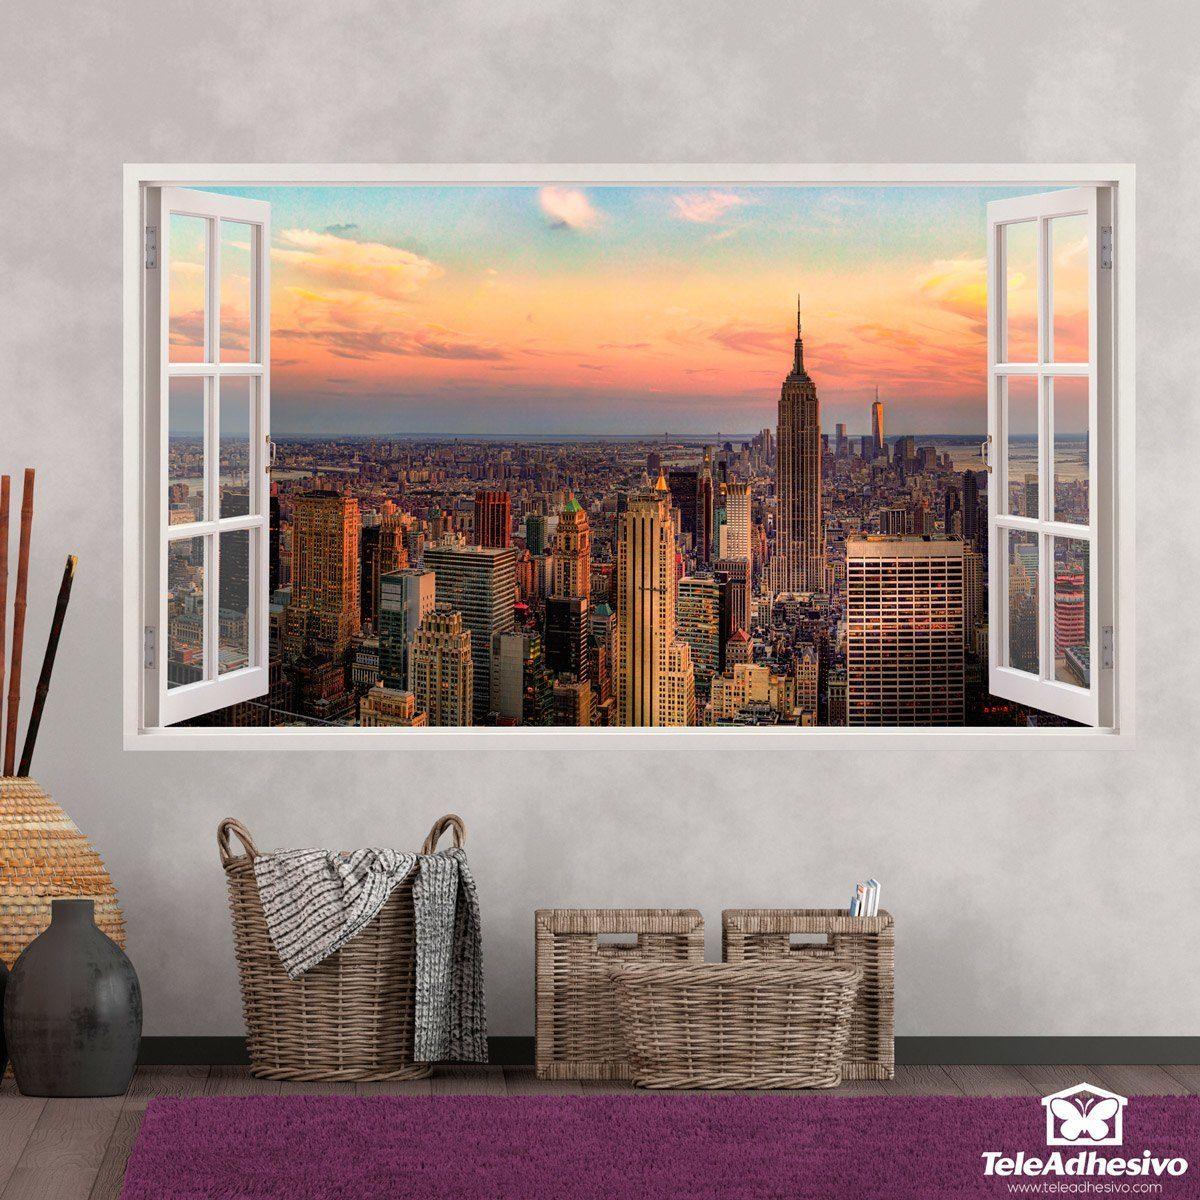 Pegatinas Para Decorar Con Forma De Ventana Teleadhesivo Muebles  # Muebles Panorama